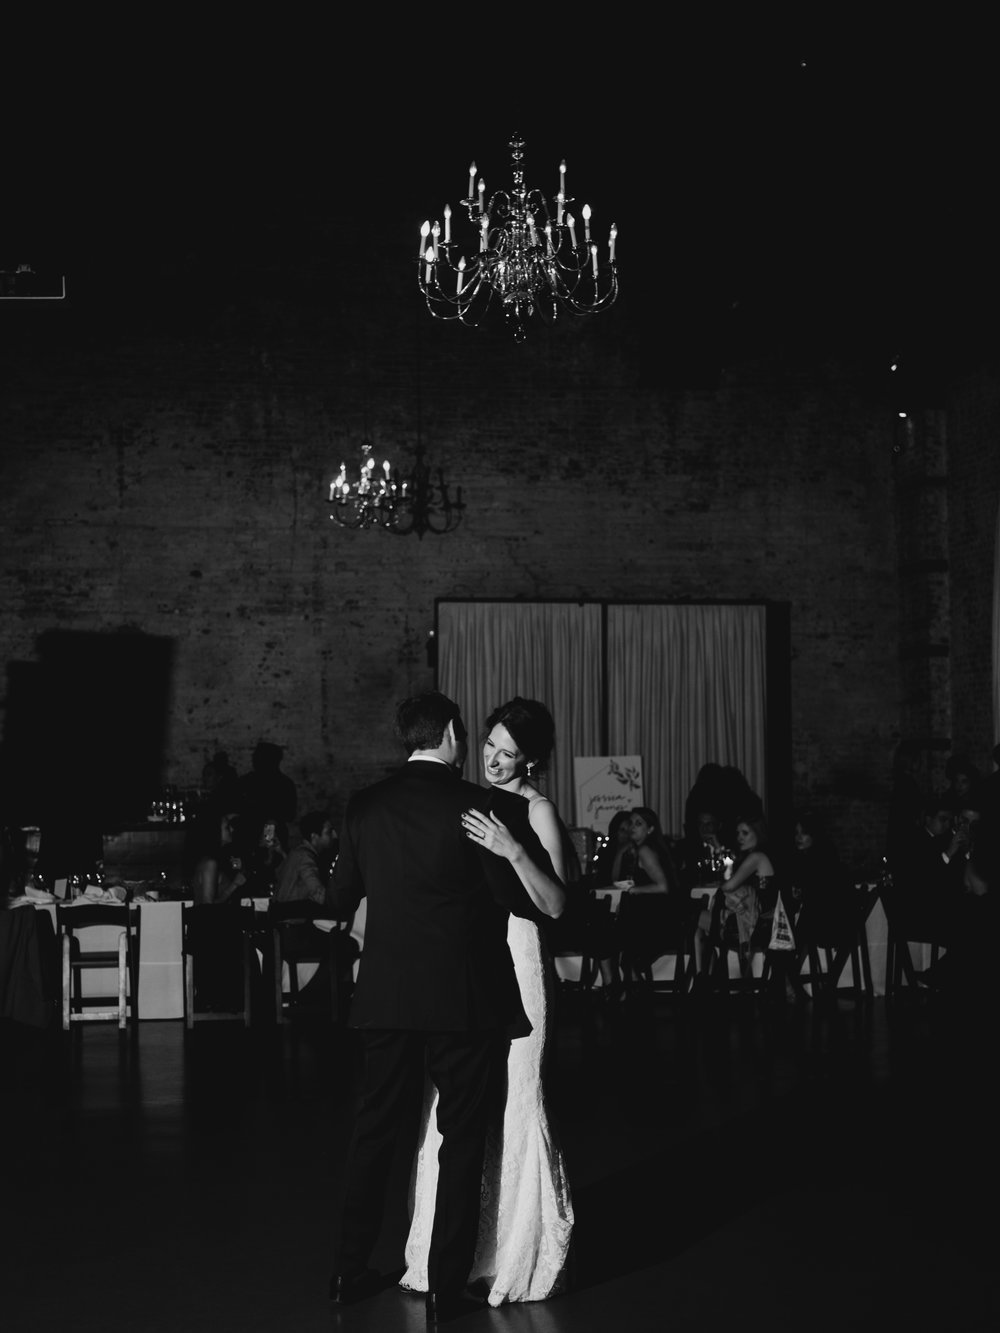 WSPCo-09292017-Jessica-James-The-Green-Building-Wedding-Photographer-124.jpg